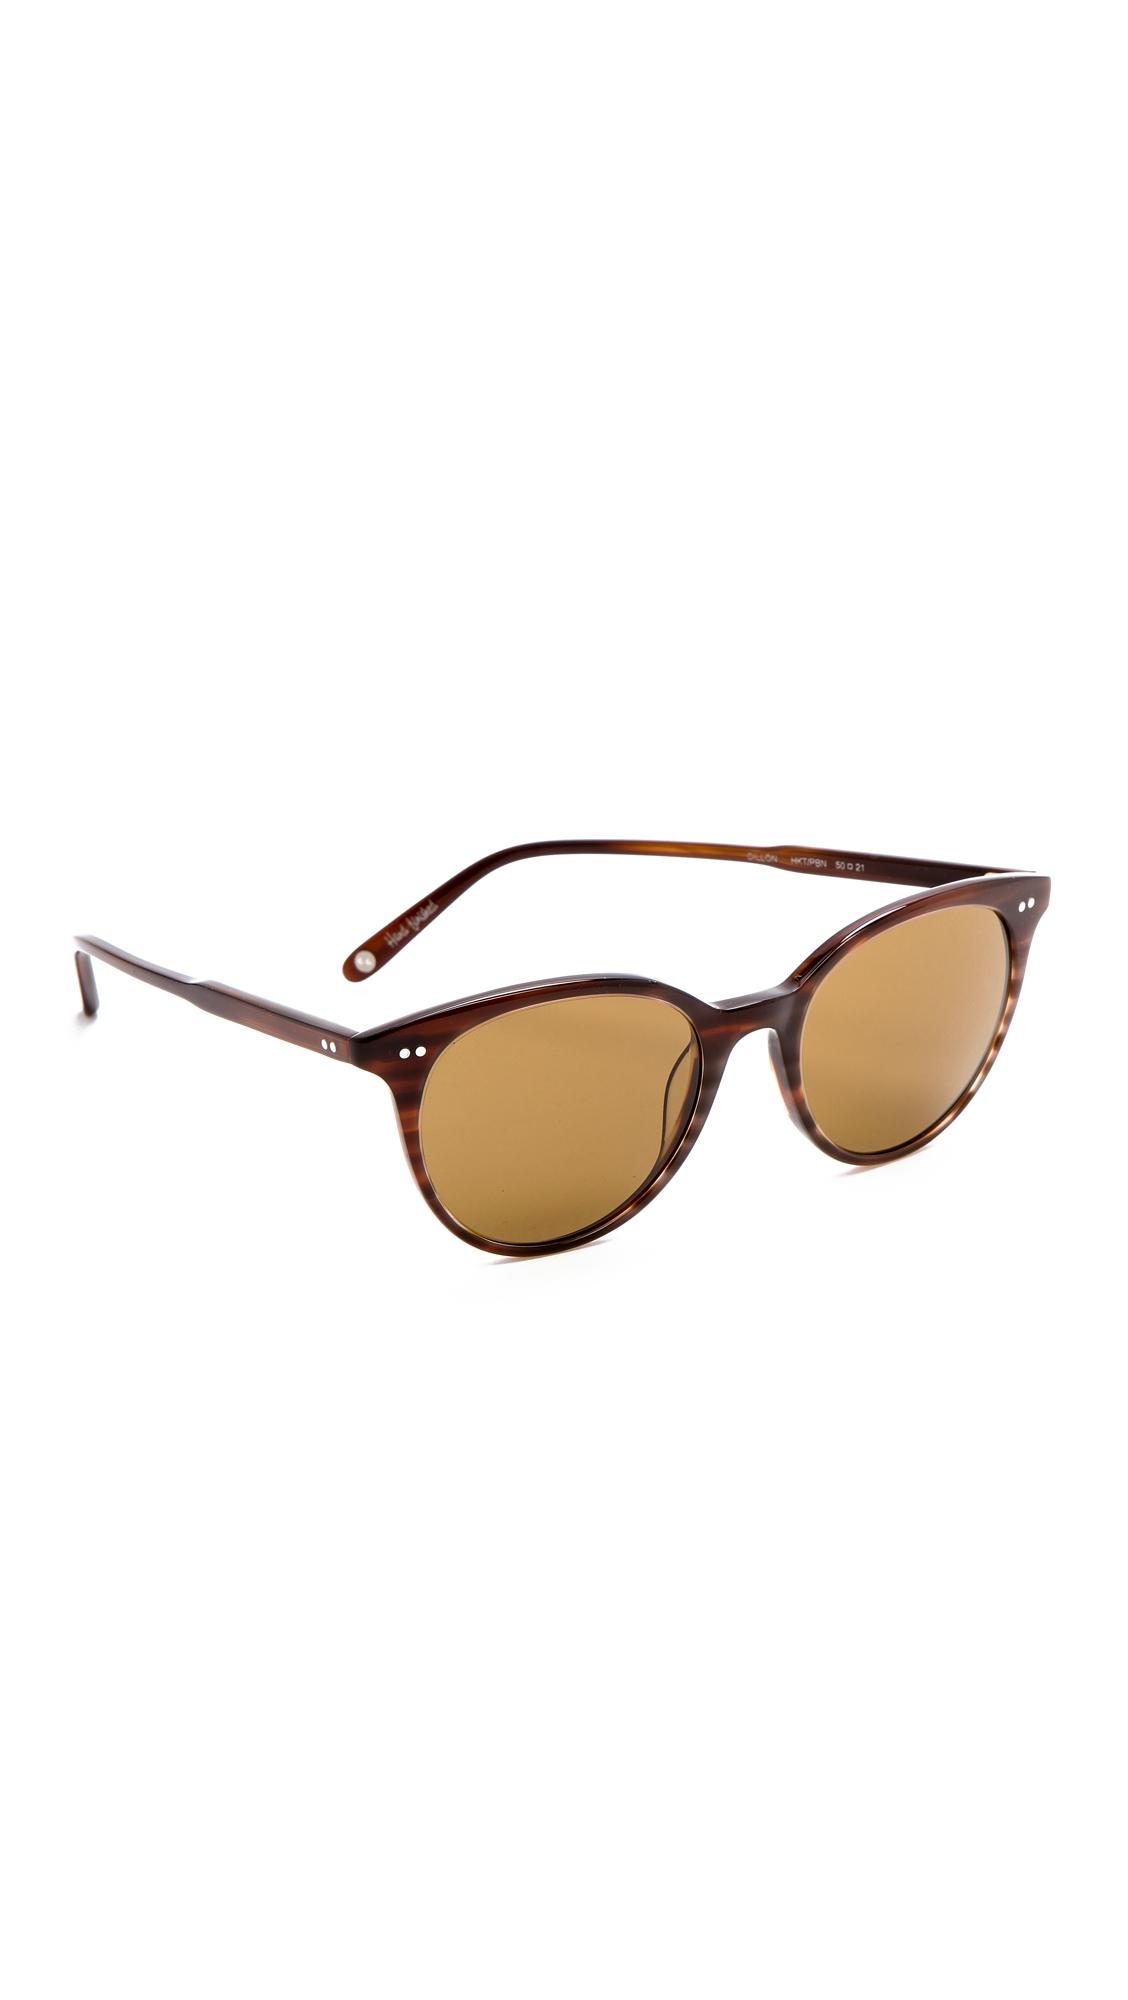 Garrett Leight Dillion Sunglasses in Brown